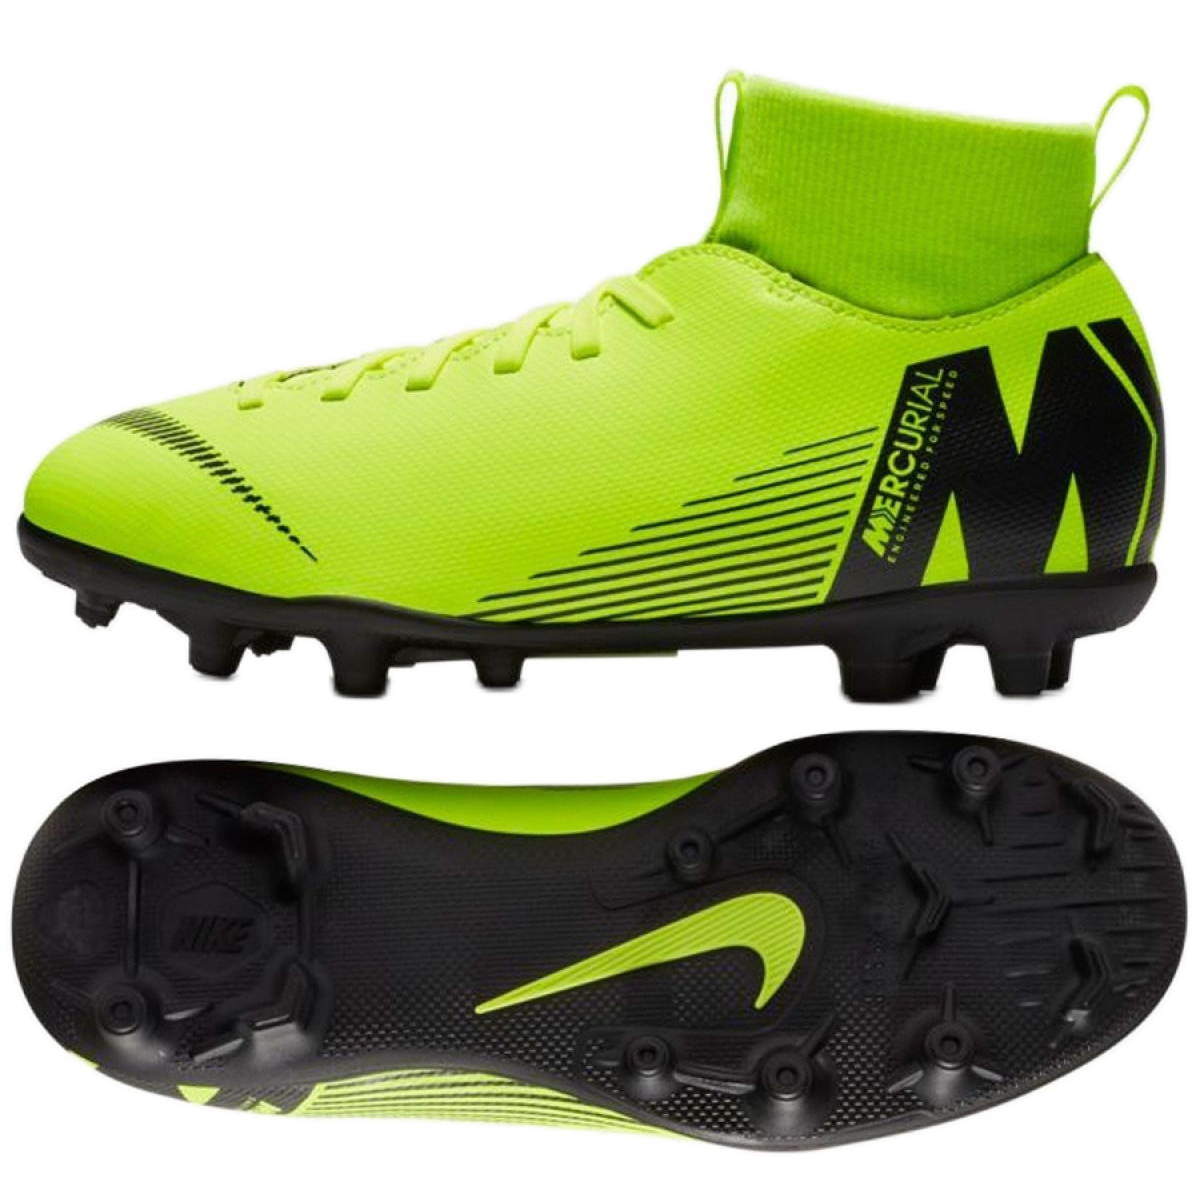 new concept ffafa 796b5 Football shoes Nike Mercurial Superfly 6 Club Mg Jr AH7339-701